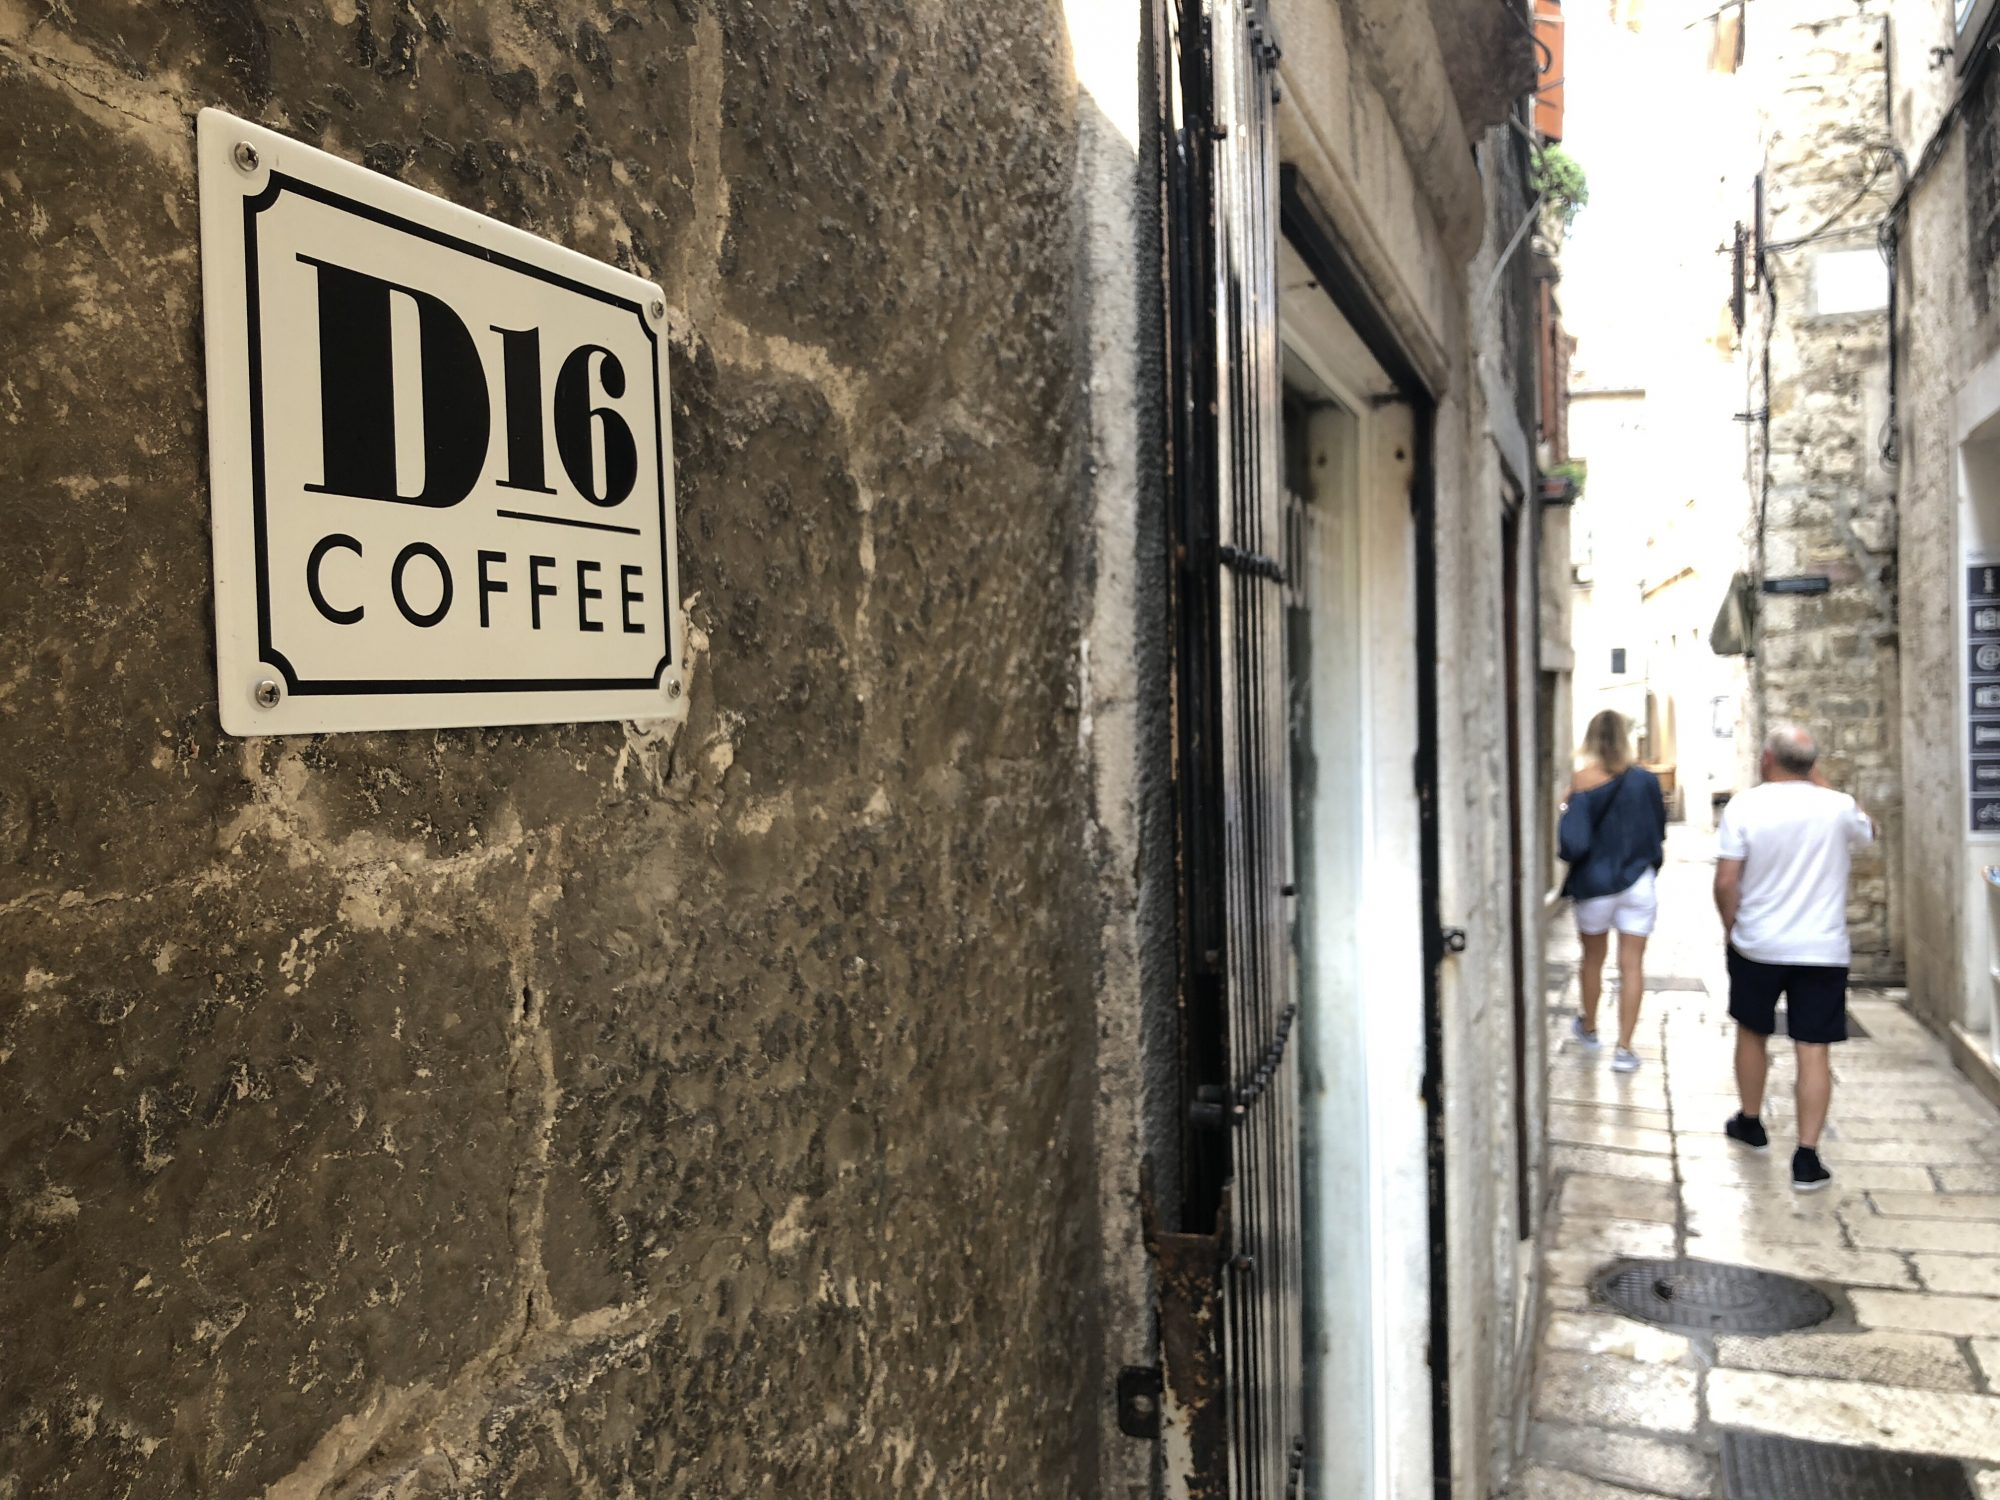 D16 coffee